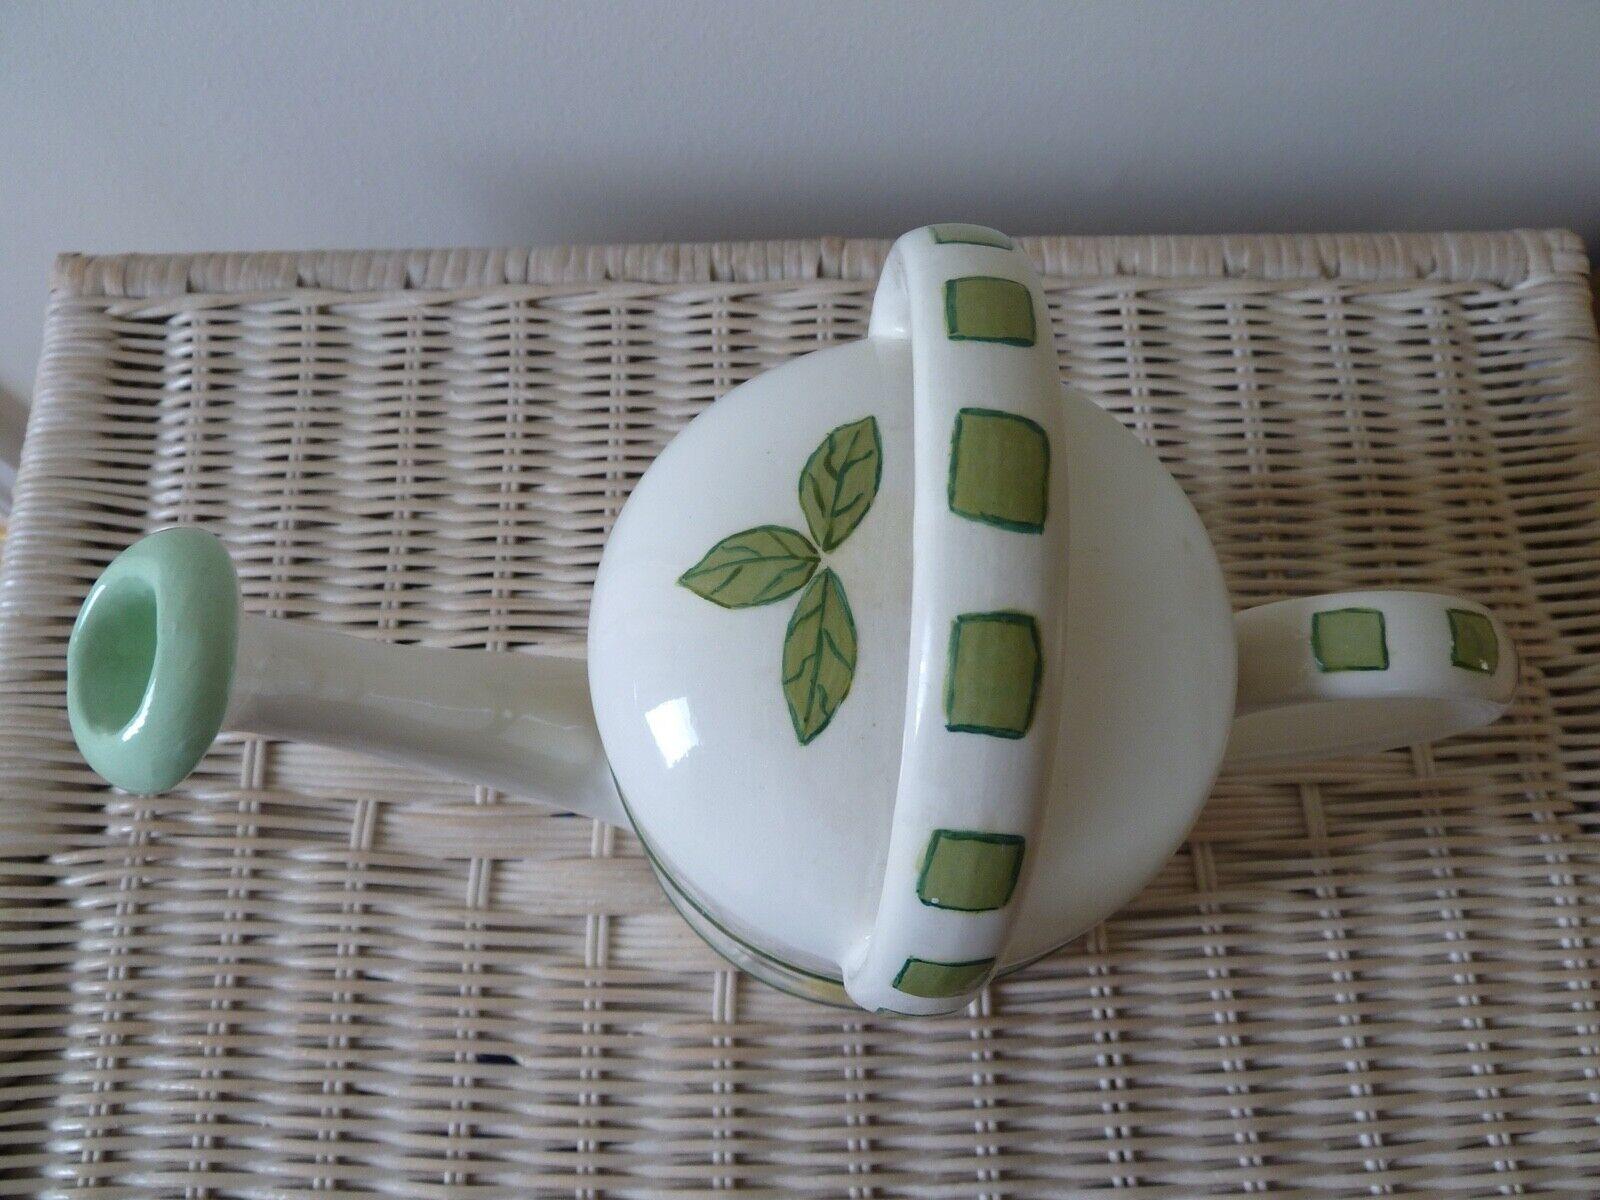 Handpainted Ceramic Watering Can. 31cm x 23cm x 13cm. Display/use. Green/Lemons